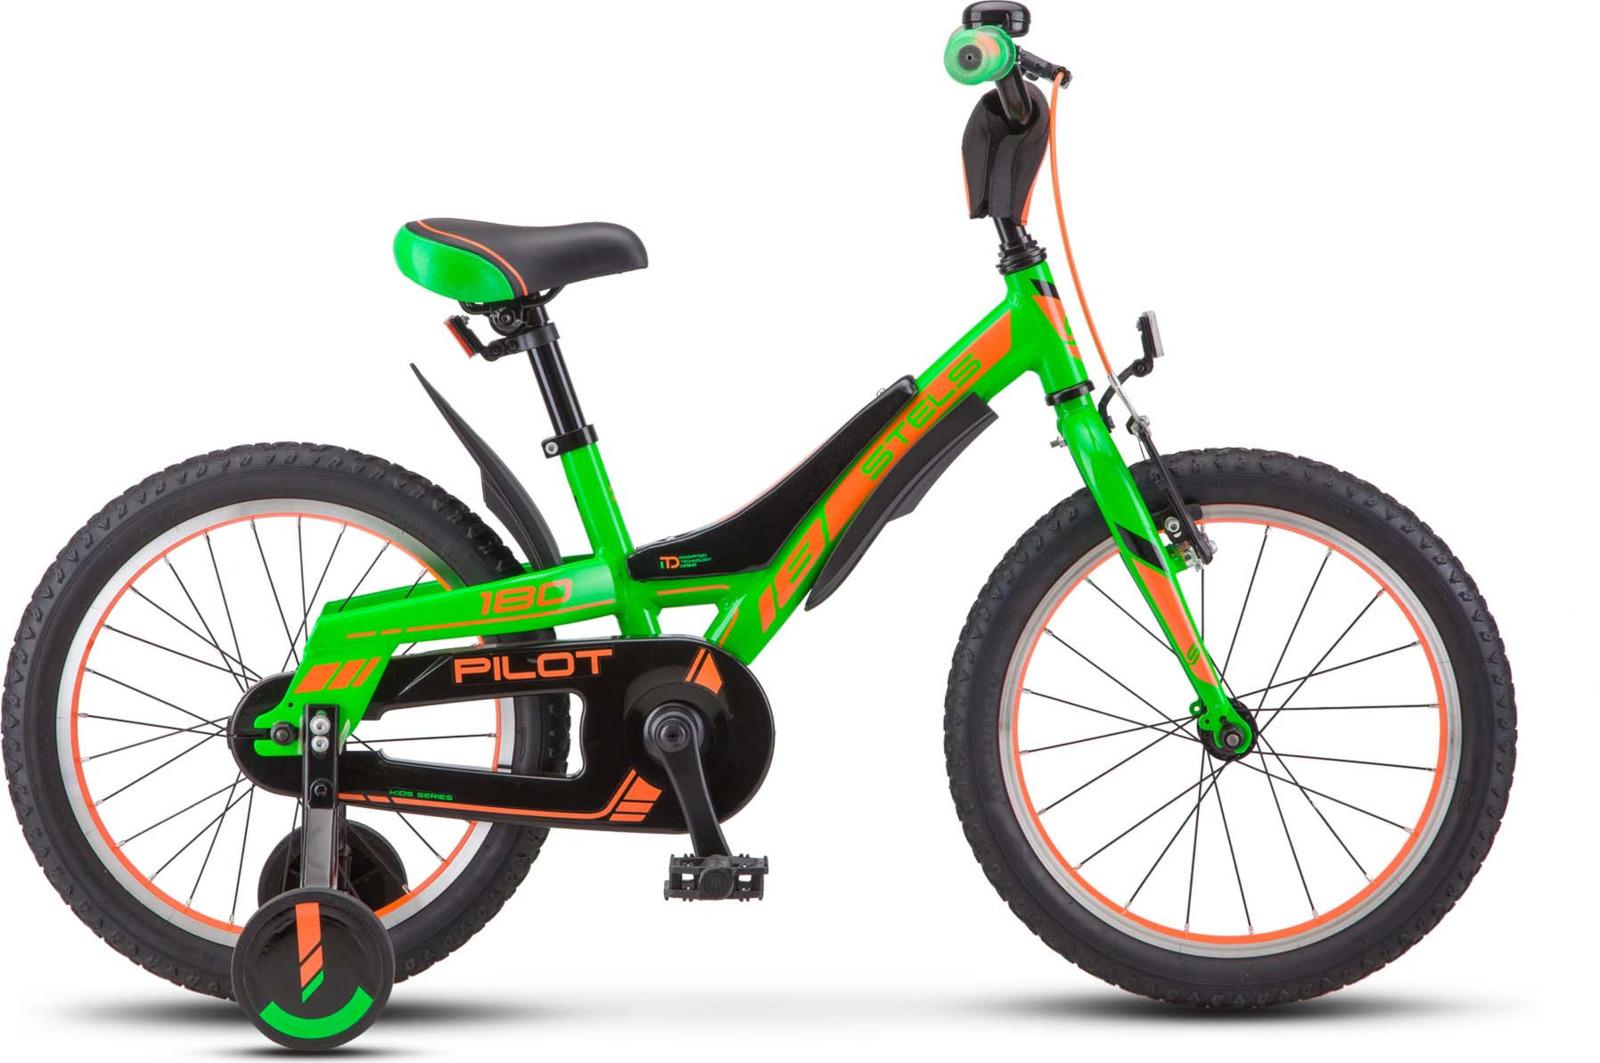 Велосипед Stels Pilot-180 16, KUBC0046952018, зеленый stels pilot 410 2017